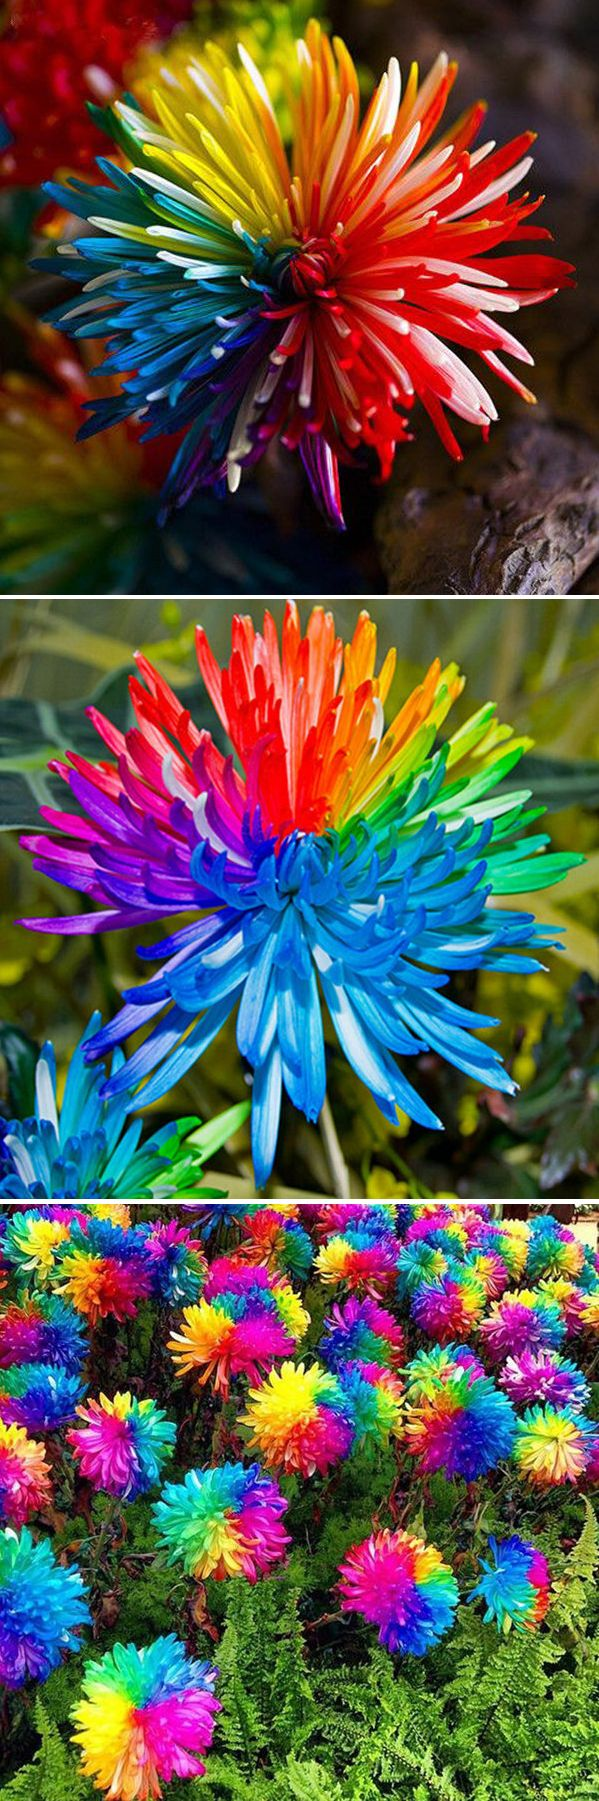 US379 20Pcs Rainbow Chrysanthemum Flower Seeds Rare Color Home Garden Bonsai Plant